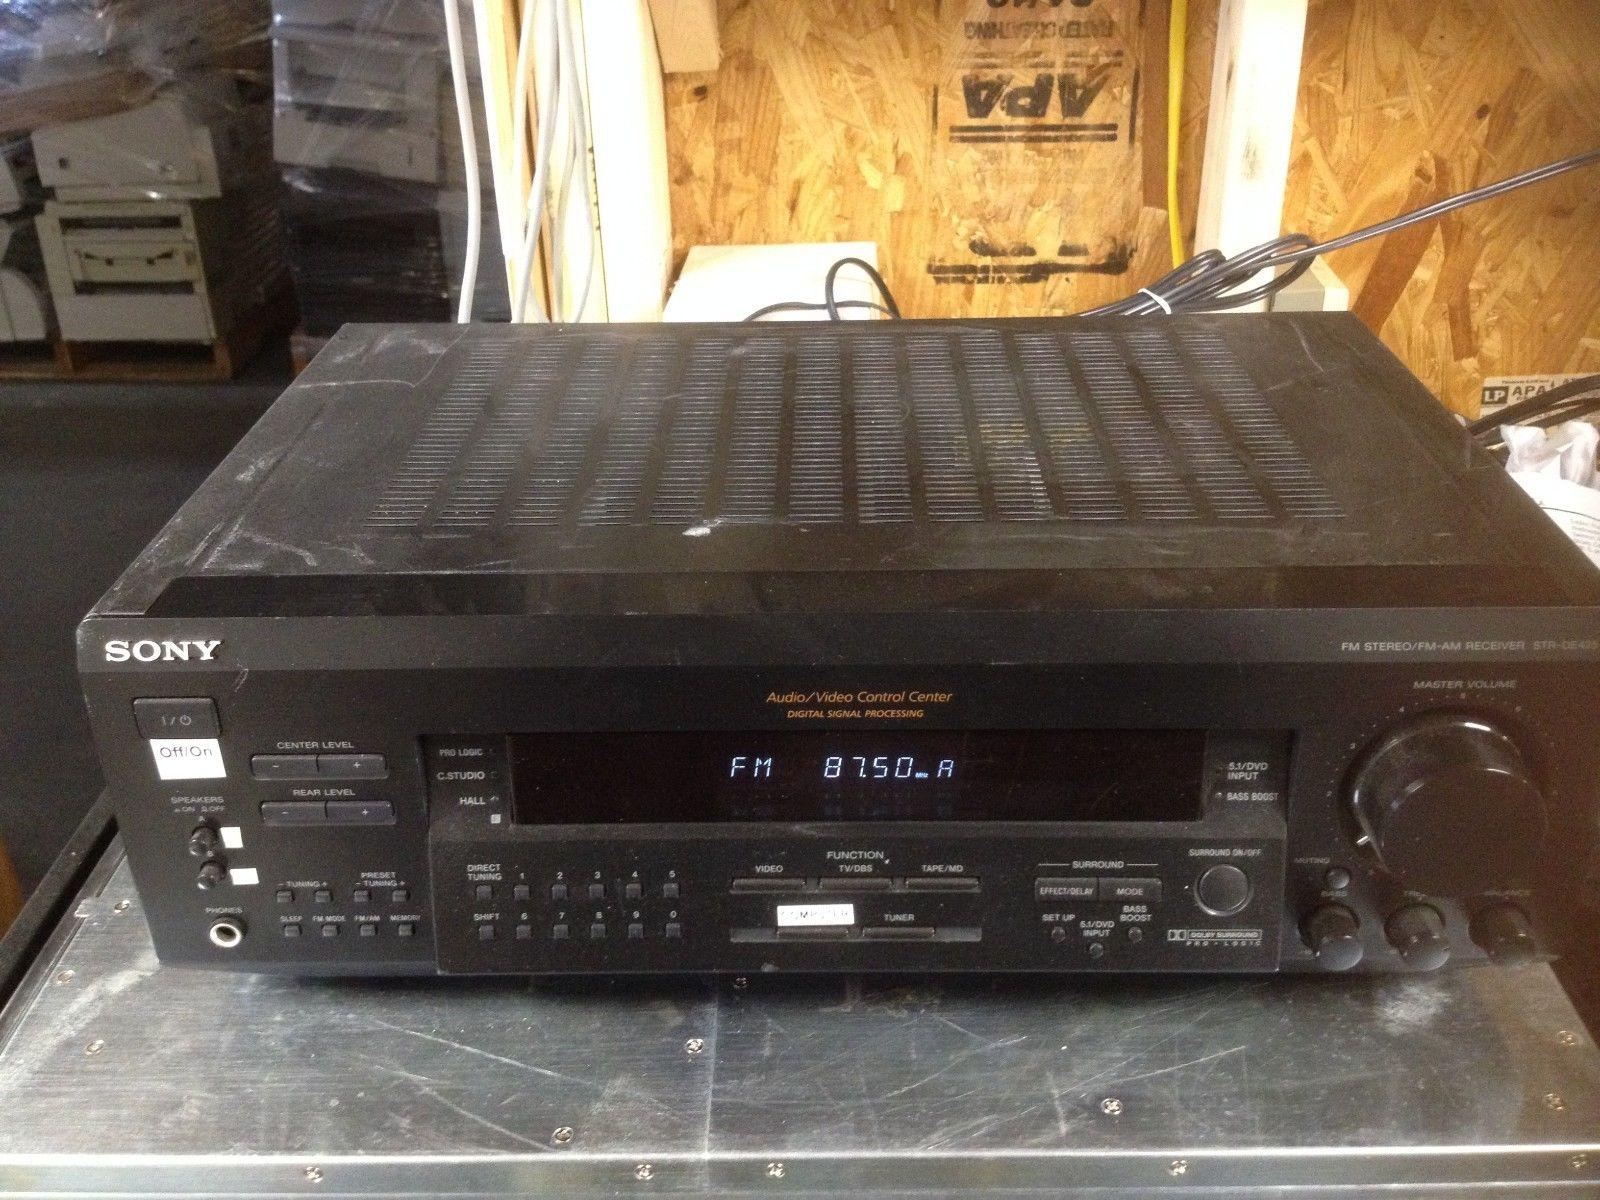 sony receiver. sony str de425 5.1 channel 500 watt fm stereo receiver w